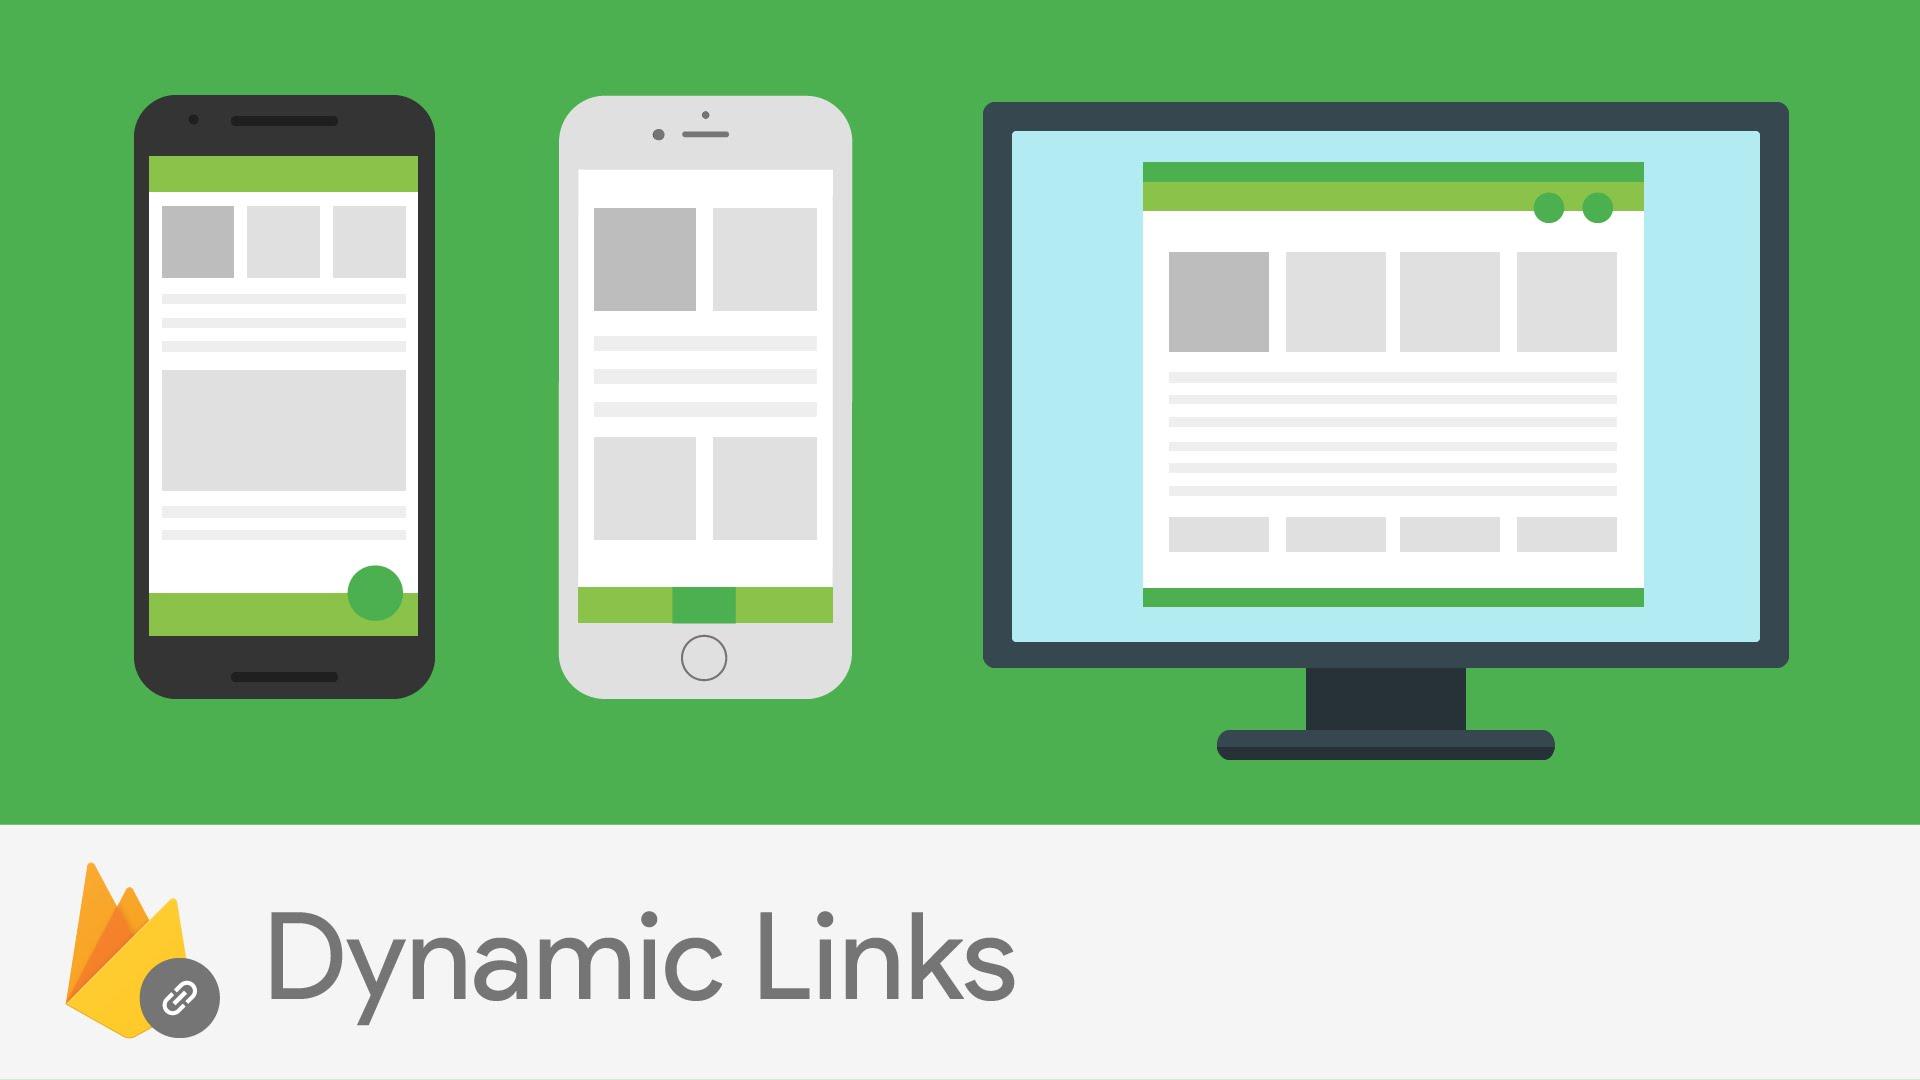 Dynamic Links